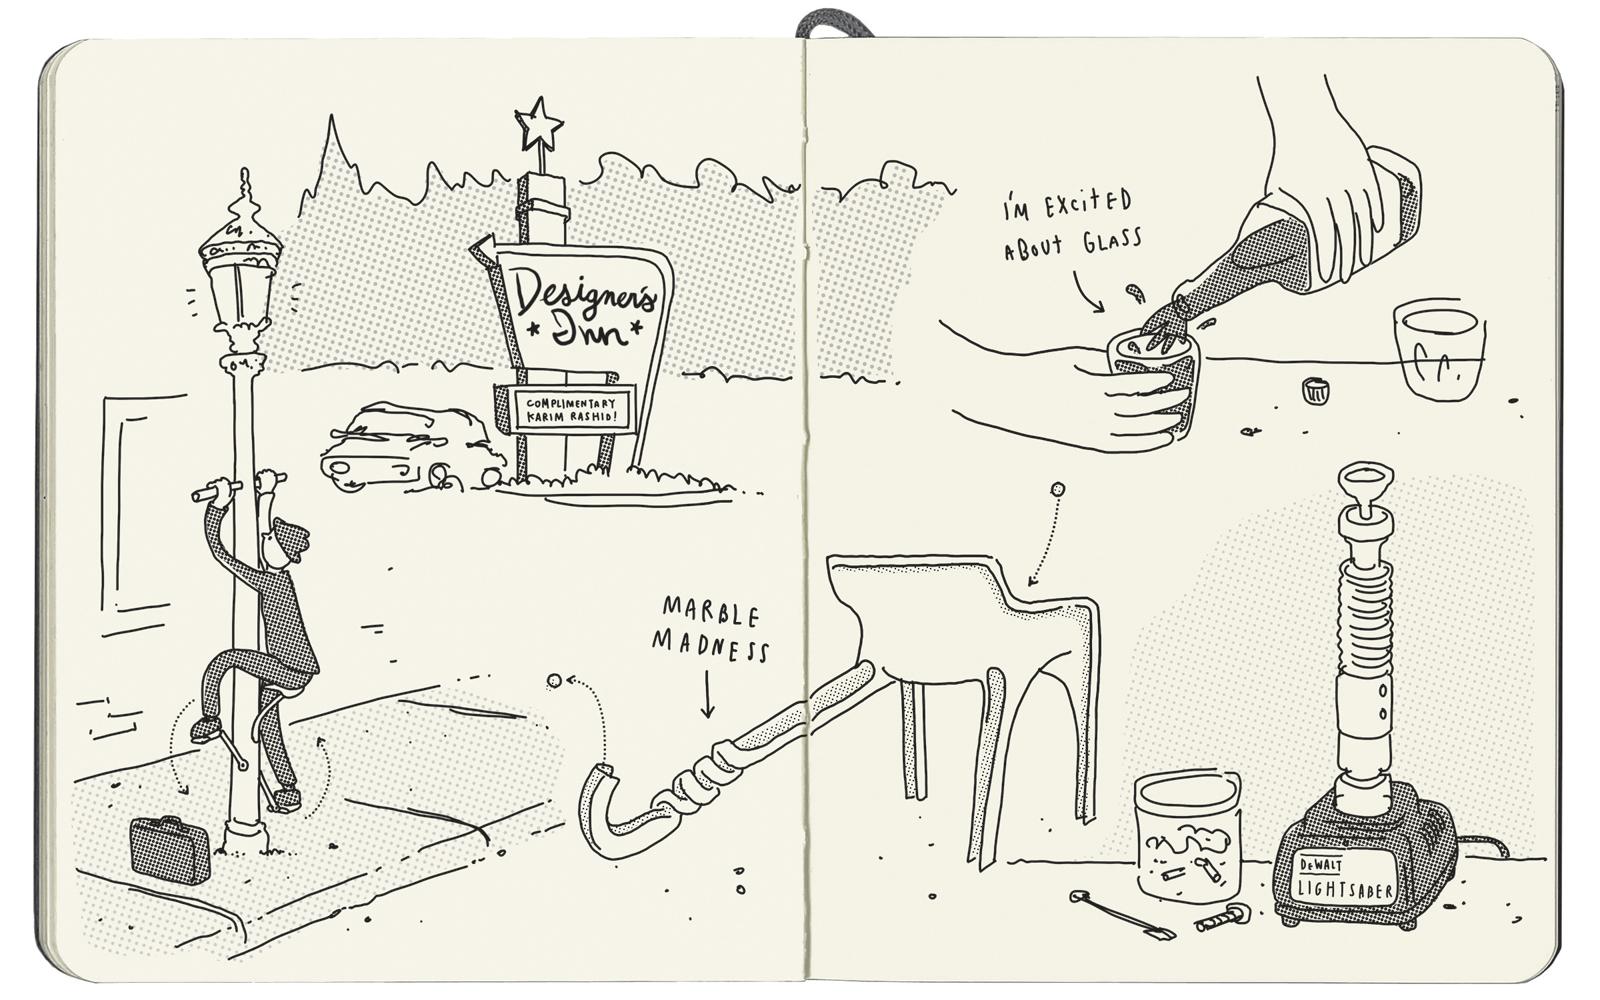 Illustration by Craighton Berman